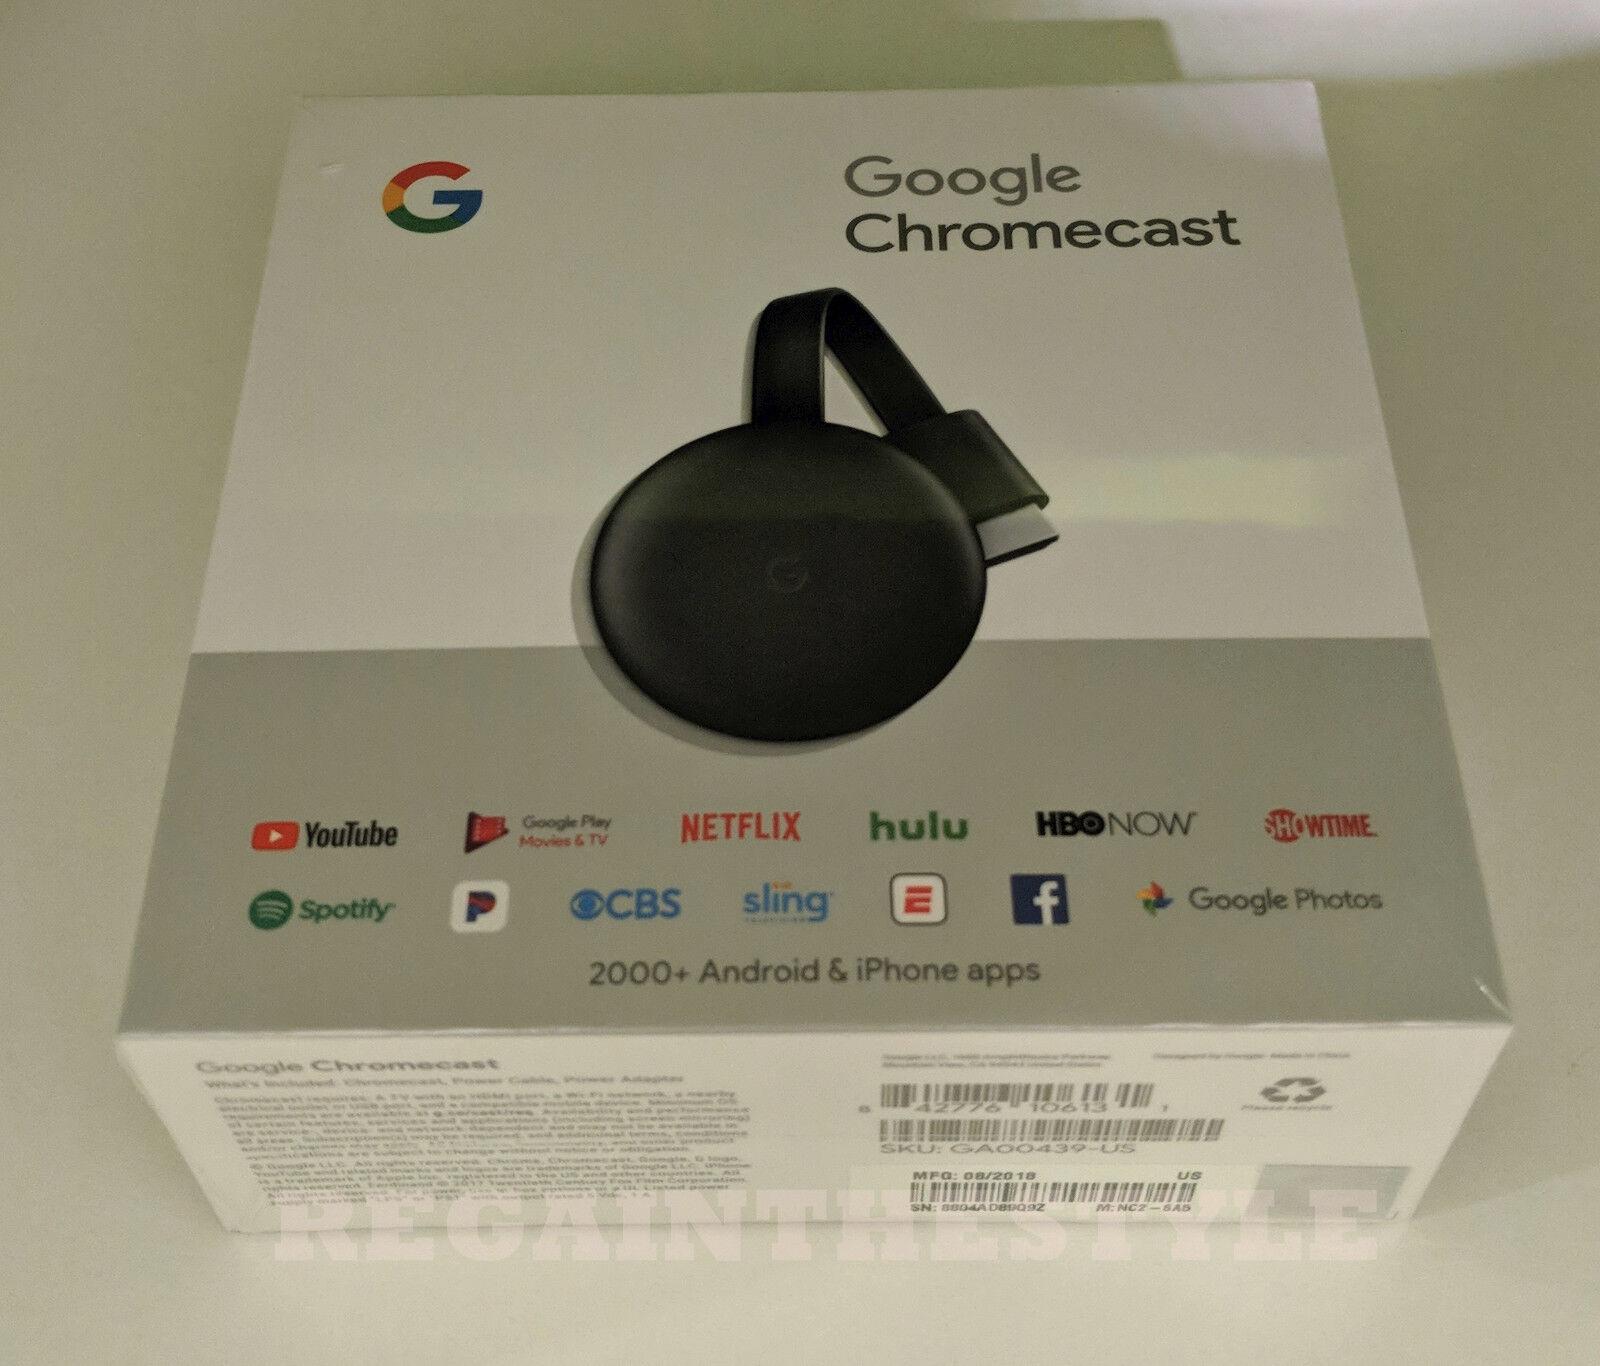 s-l1600 Google Chromecast 3rd Gen Digital HDMI Media Streaming Device (2018 Version)